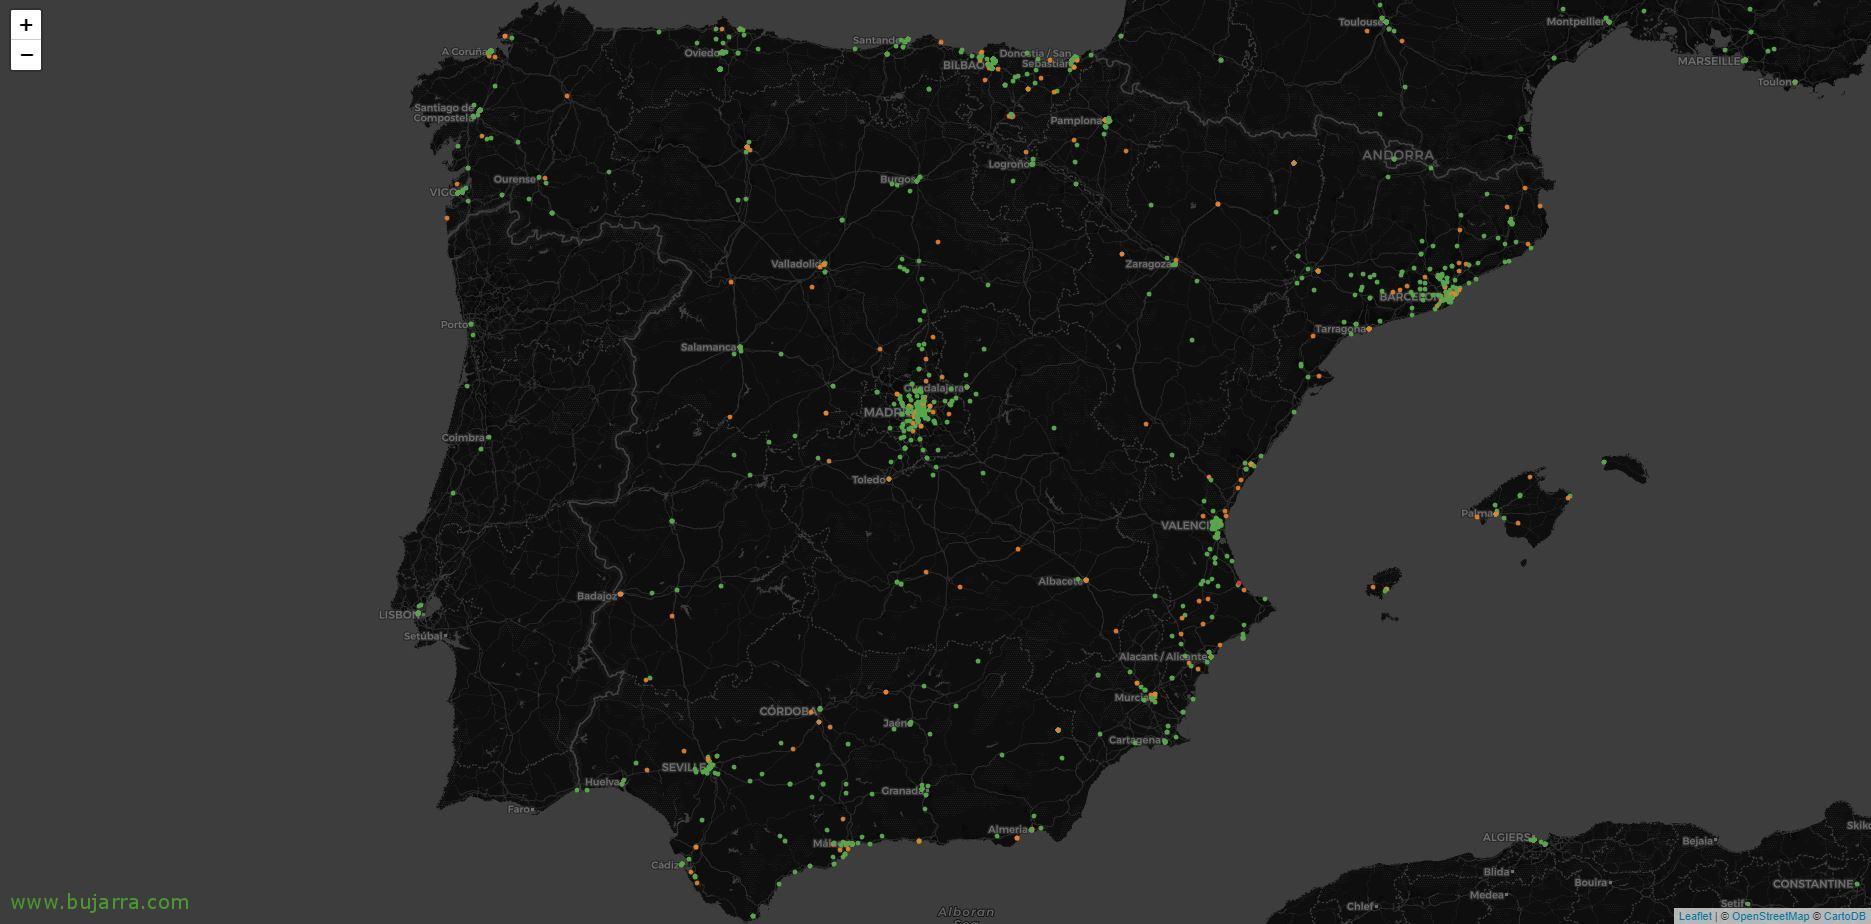 Grafana-Worldmap-MySQL-04